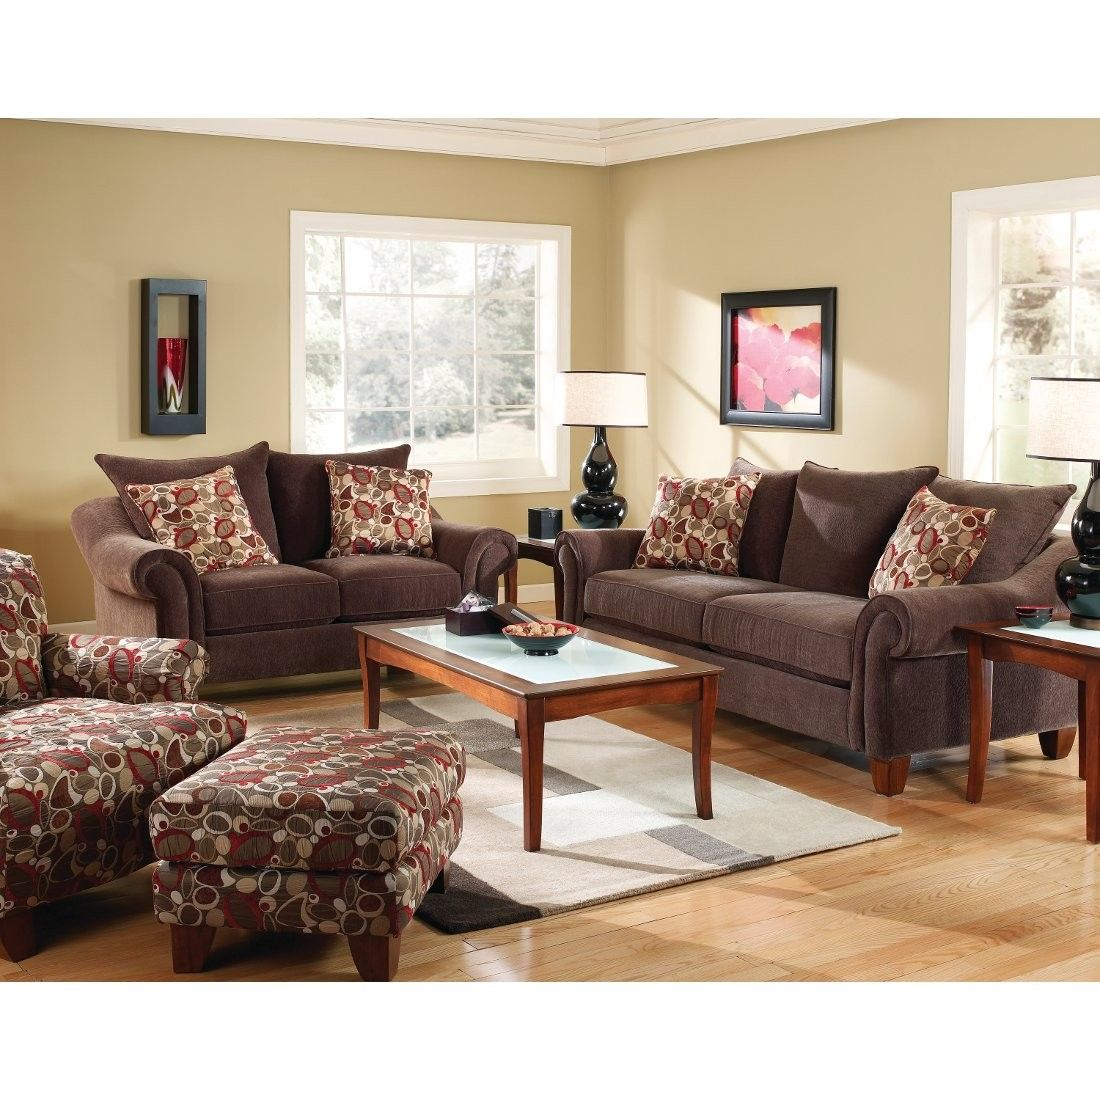 Corinthian Evolution Ottoman Copper Ao128 Conn S Red Living Room Set Stylish Living Room Sofa And Loveseat Set